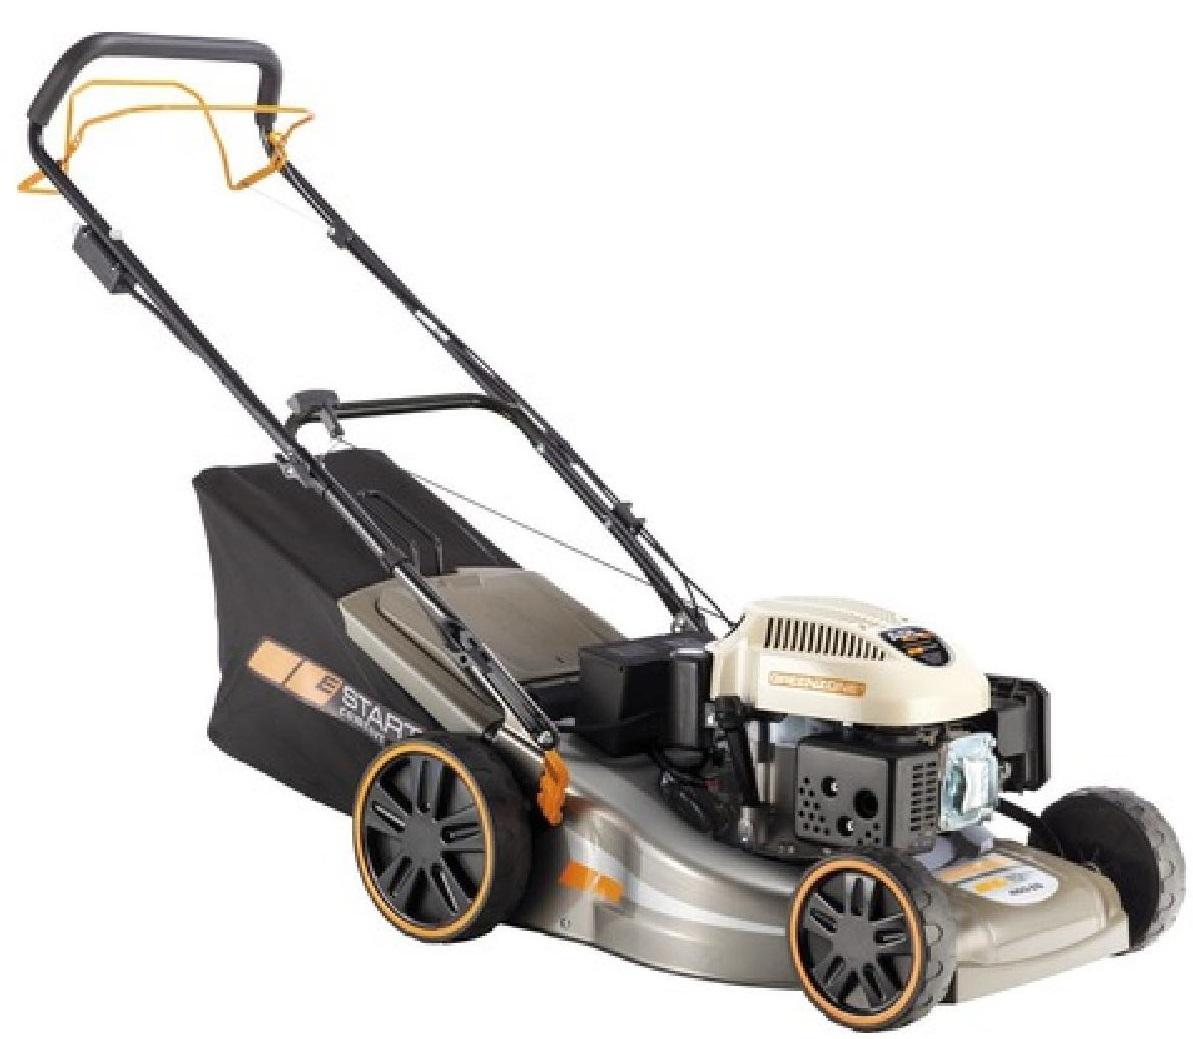 rasenm her al ko greenzone comfort 460 es werth motorger te. Black Bedroom Furniture Sets. Home Design Ideas